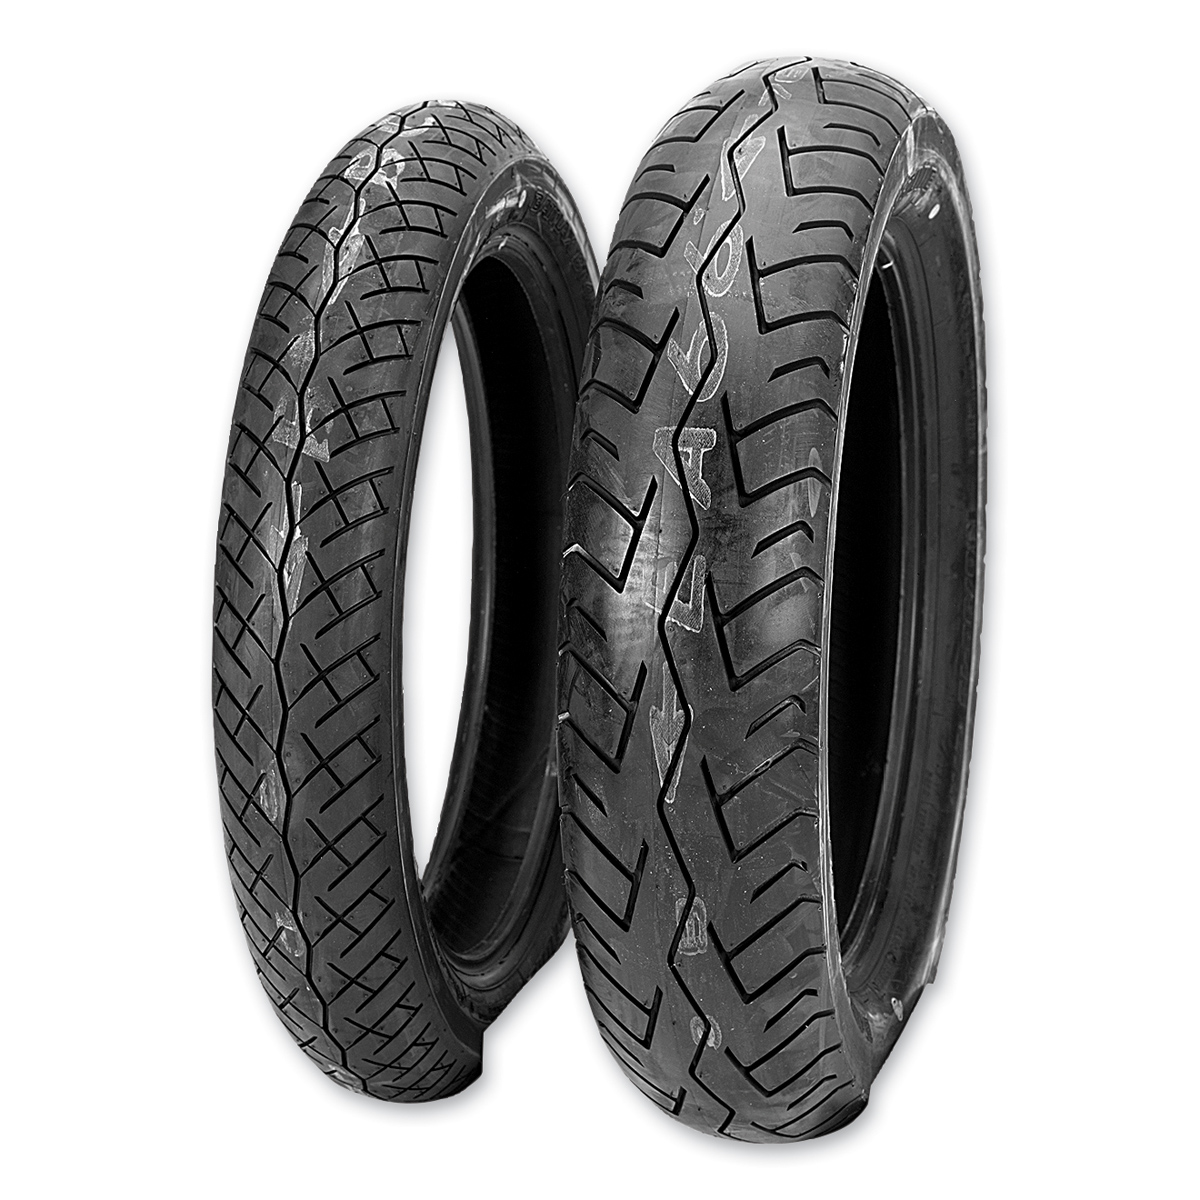 Bridgestone BT45F 110/70-17 Front Tire